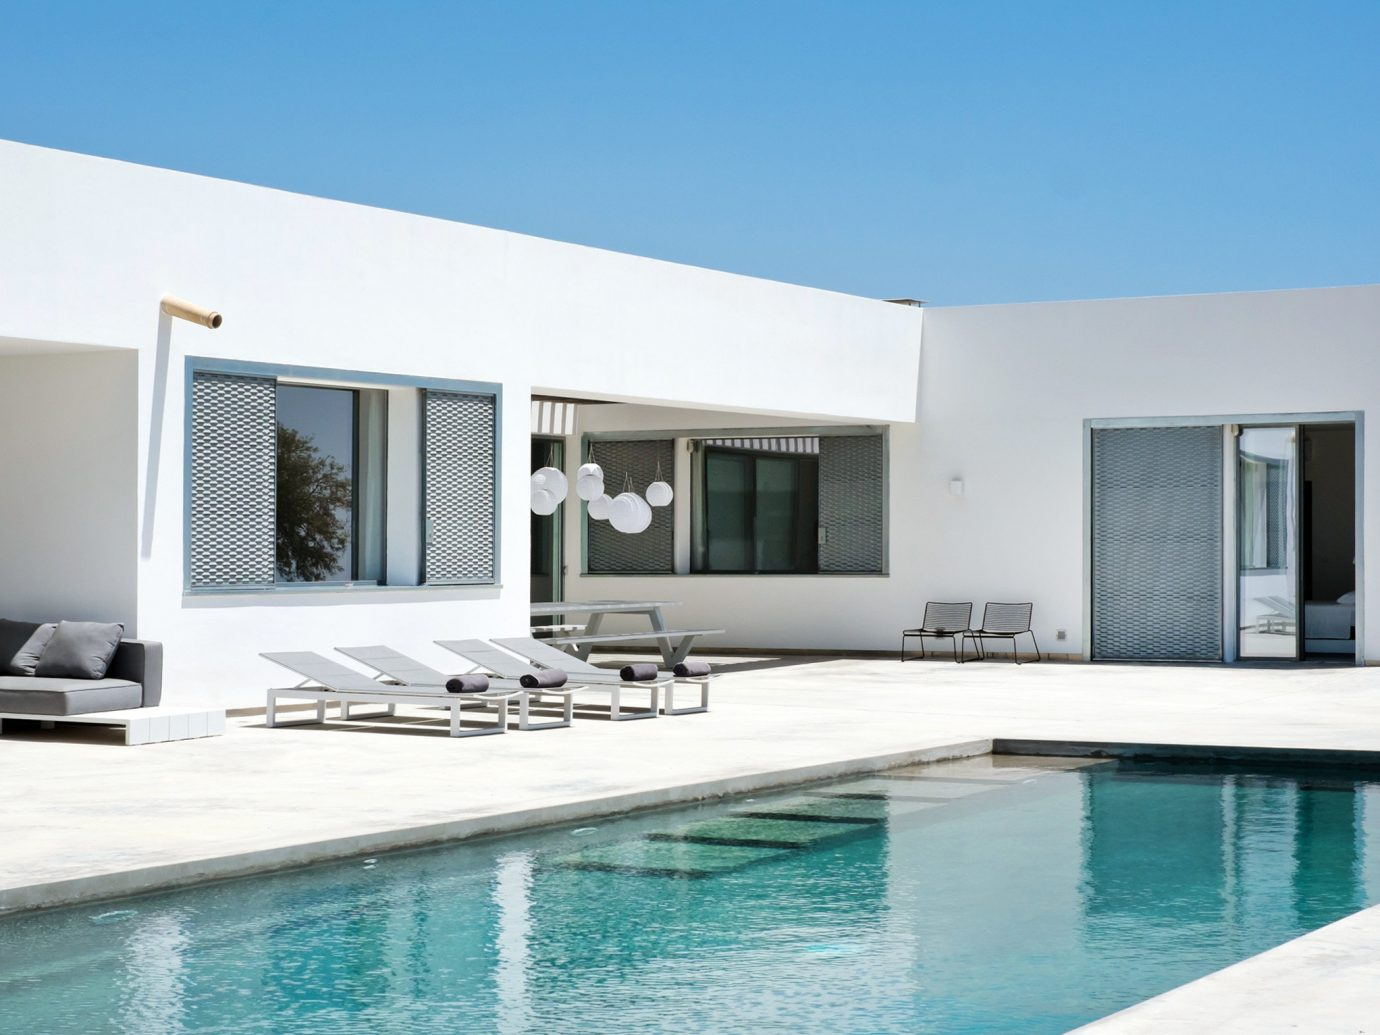 water Pool property swimming pool condominium house swimming Villa room home real estate estate facade interior design professional living room Design apartment